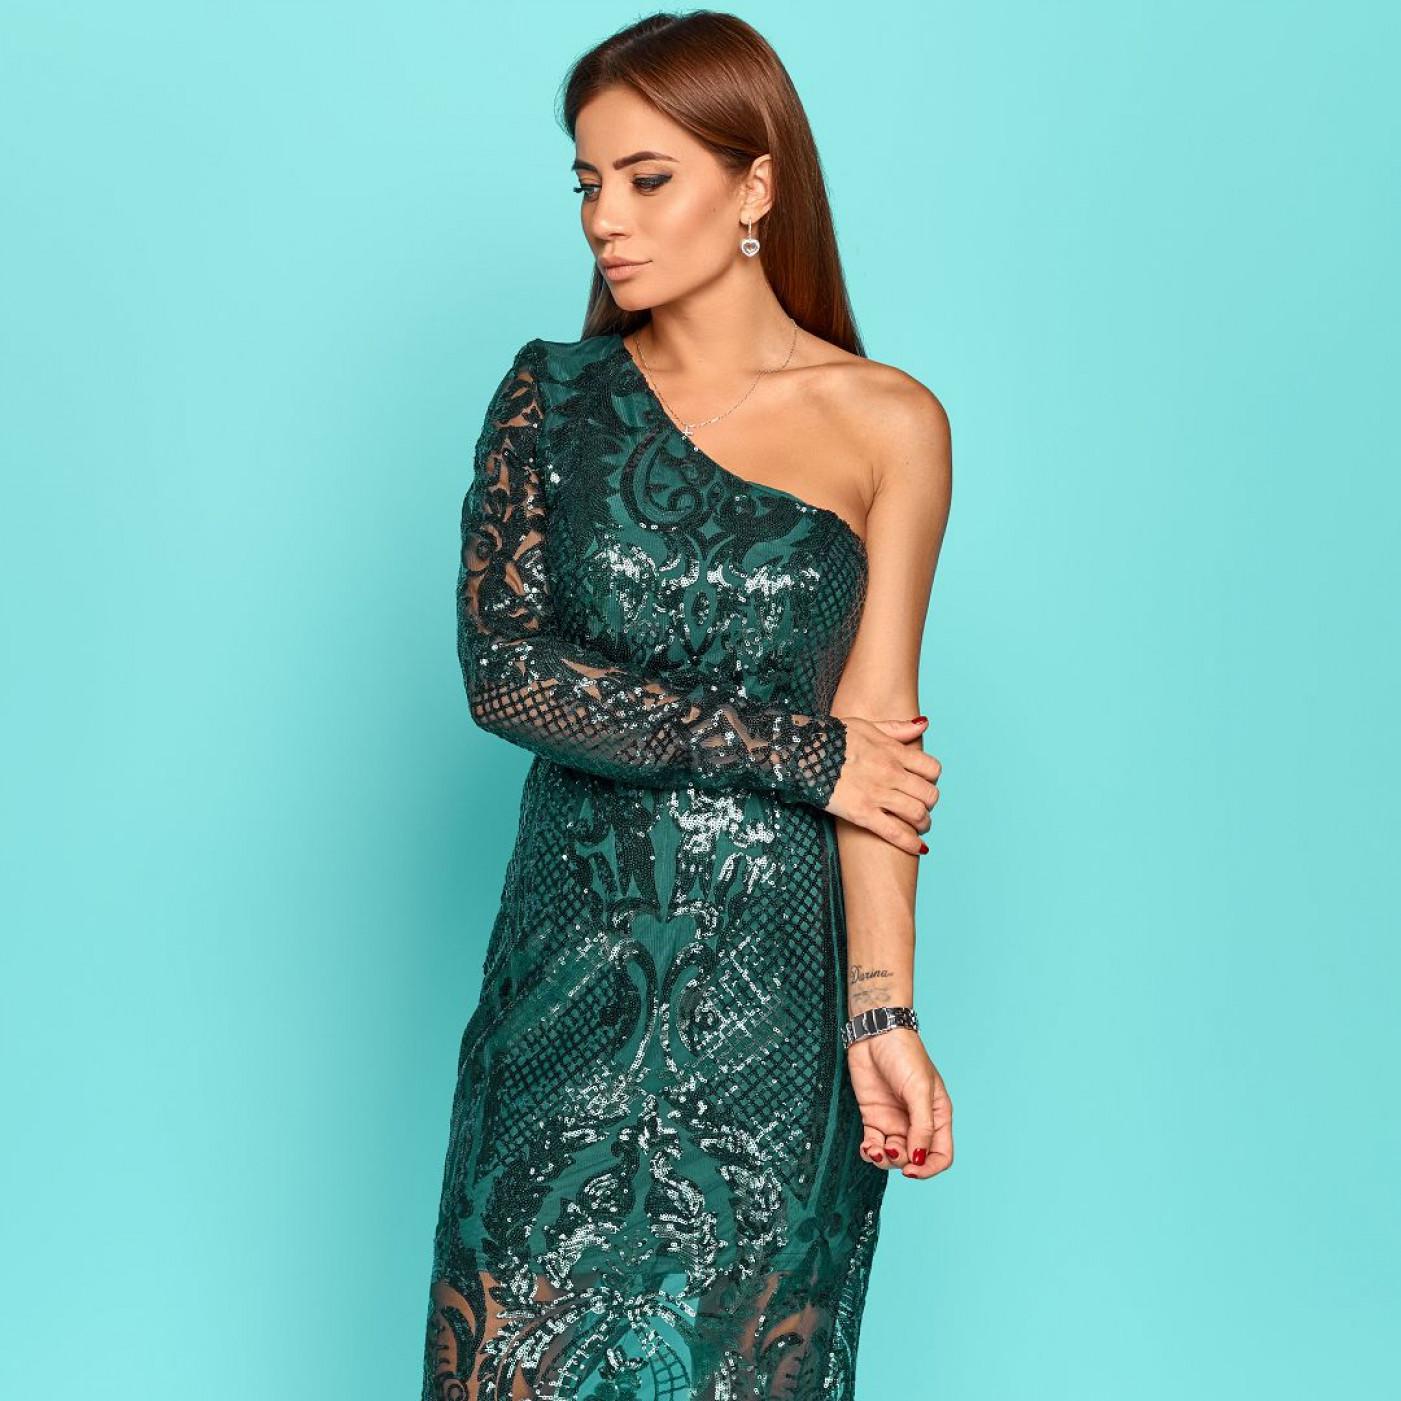 Платье из пайеток с узором на один рукав 11275